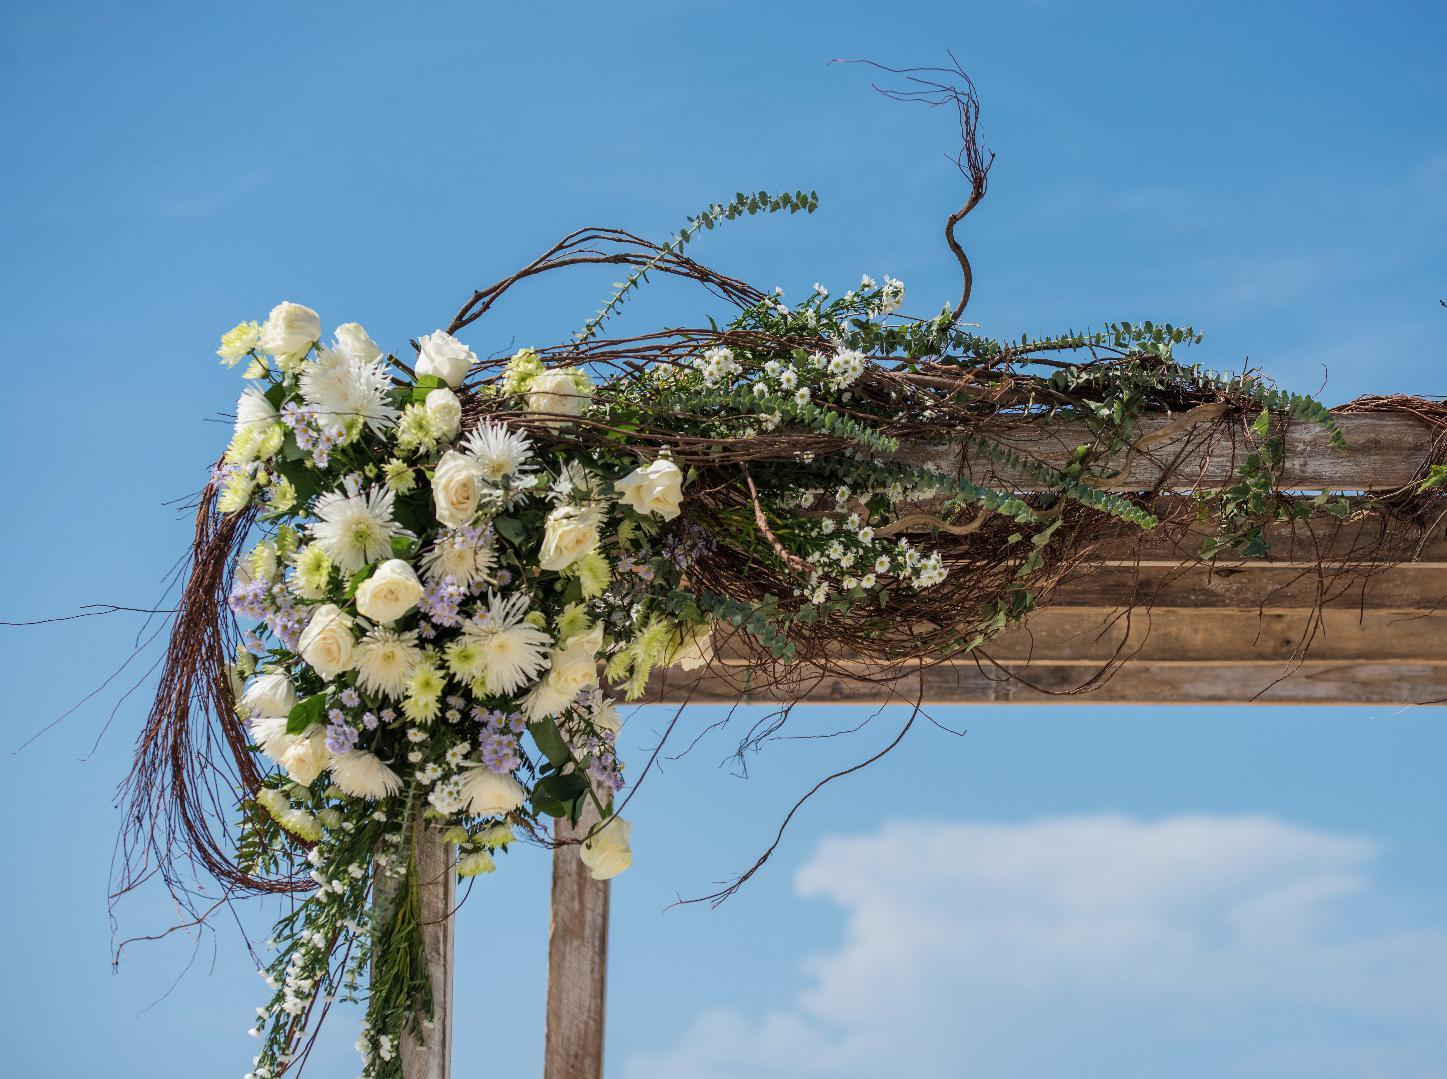 bodas-sin-clasificar-sin-tema-cuba-34372.jpg